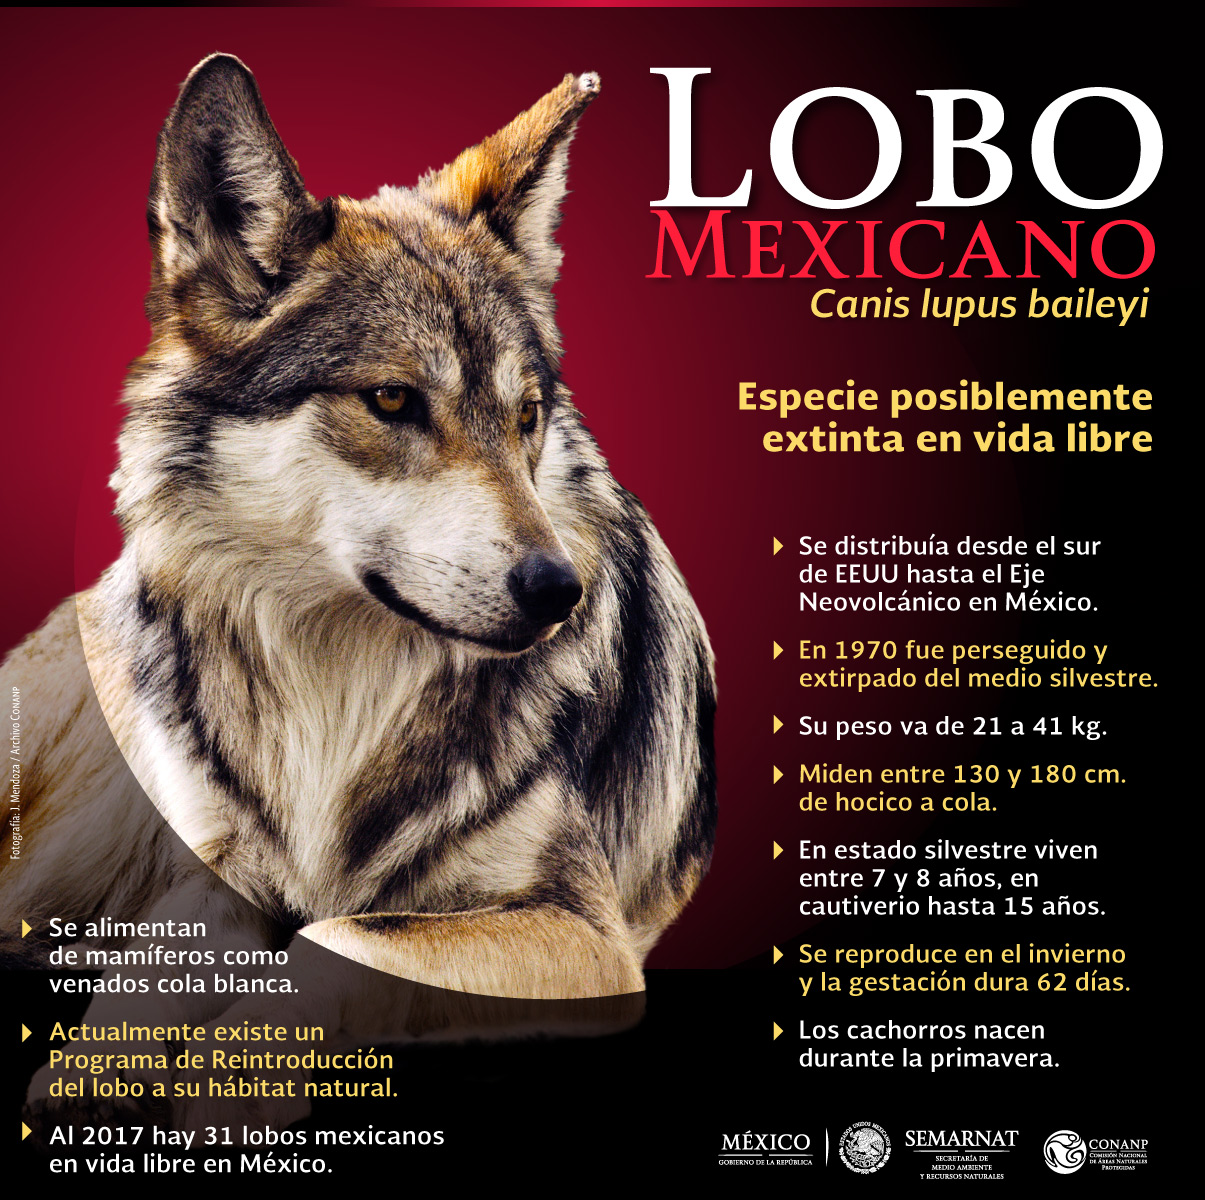 /cms/uploads/image/file/297116/INFOGRAF_A_LOBO_MEXICANO.jpg